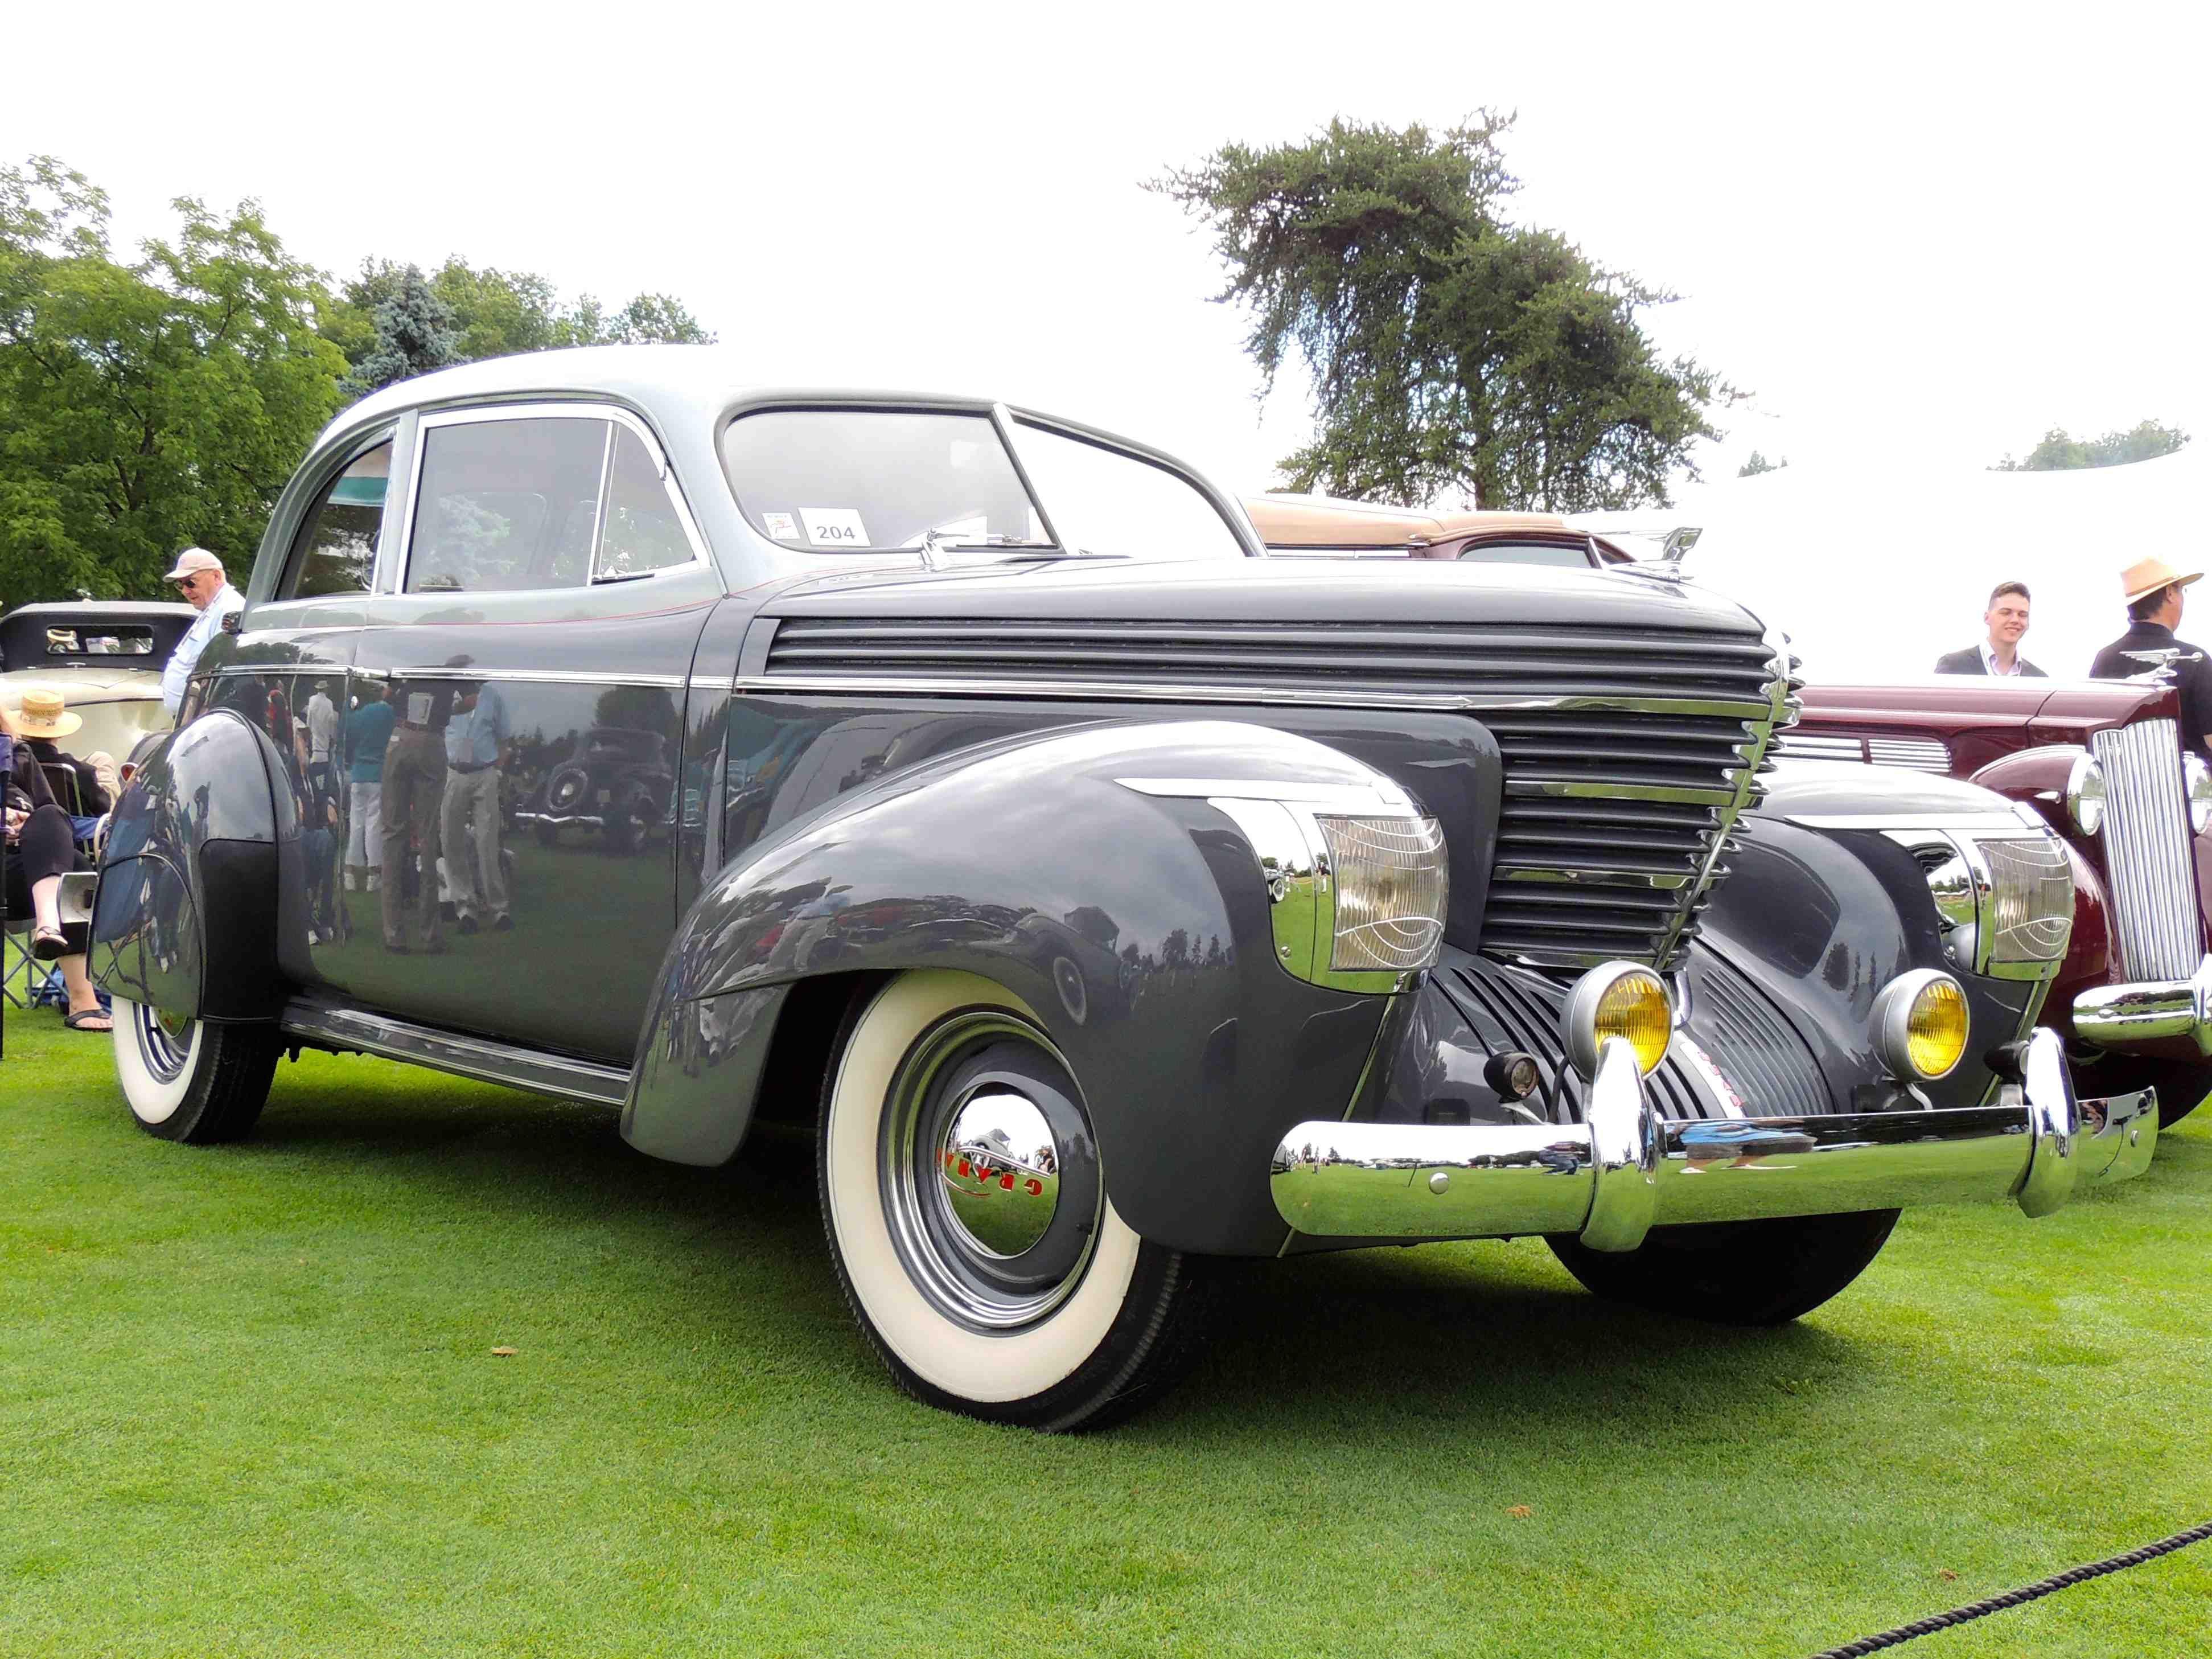 old european cars - Google Search | Transportation | Pinterest ...